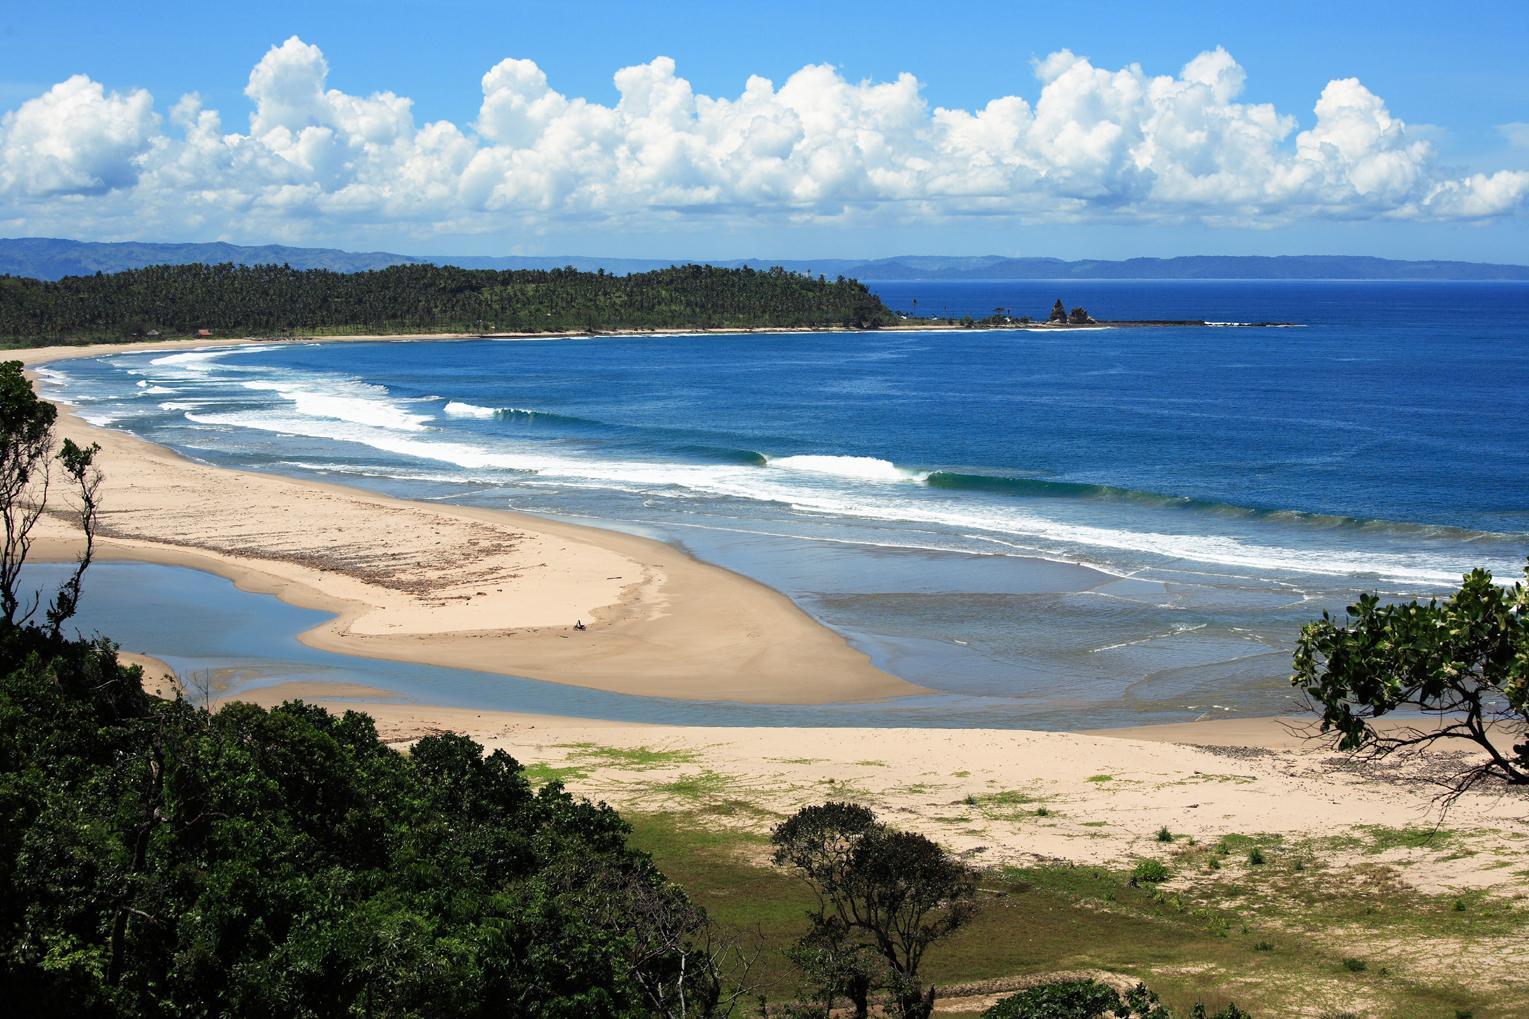 Pariwisata Kabupaten Lebak Blogger Lindawati Blog Ciantir Beach Sawarna Pantai